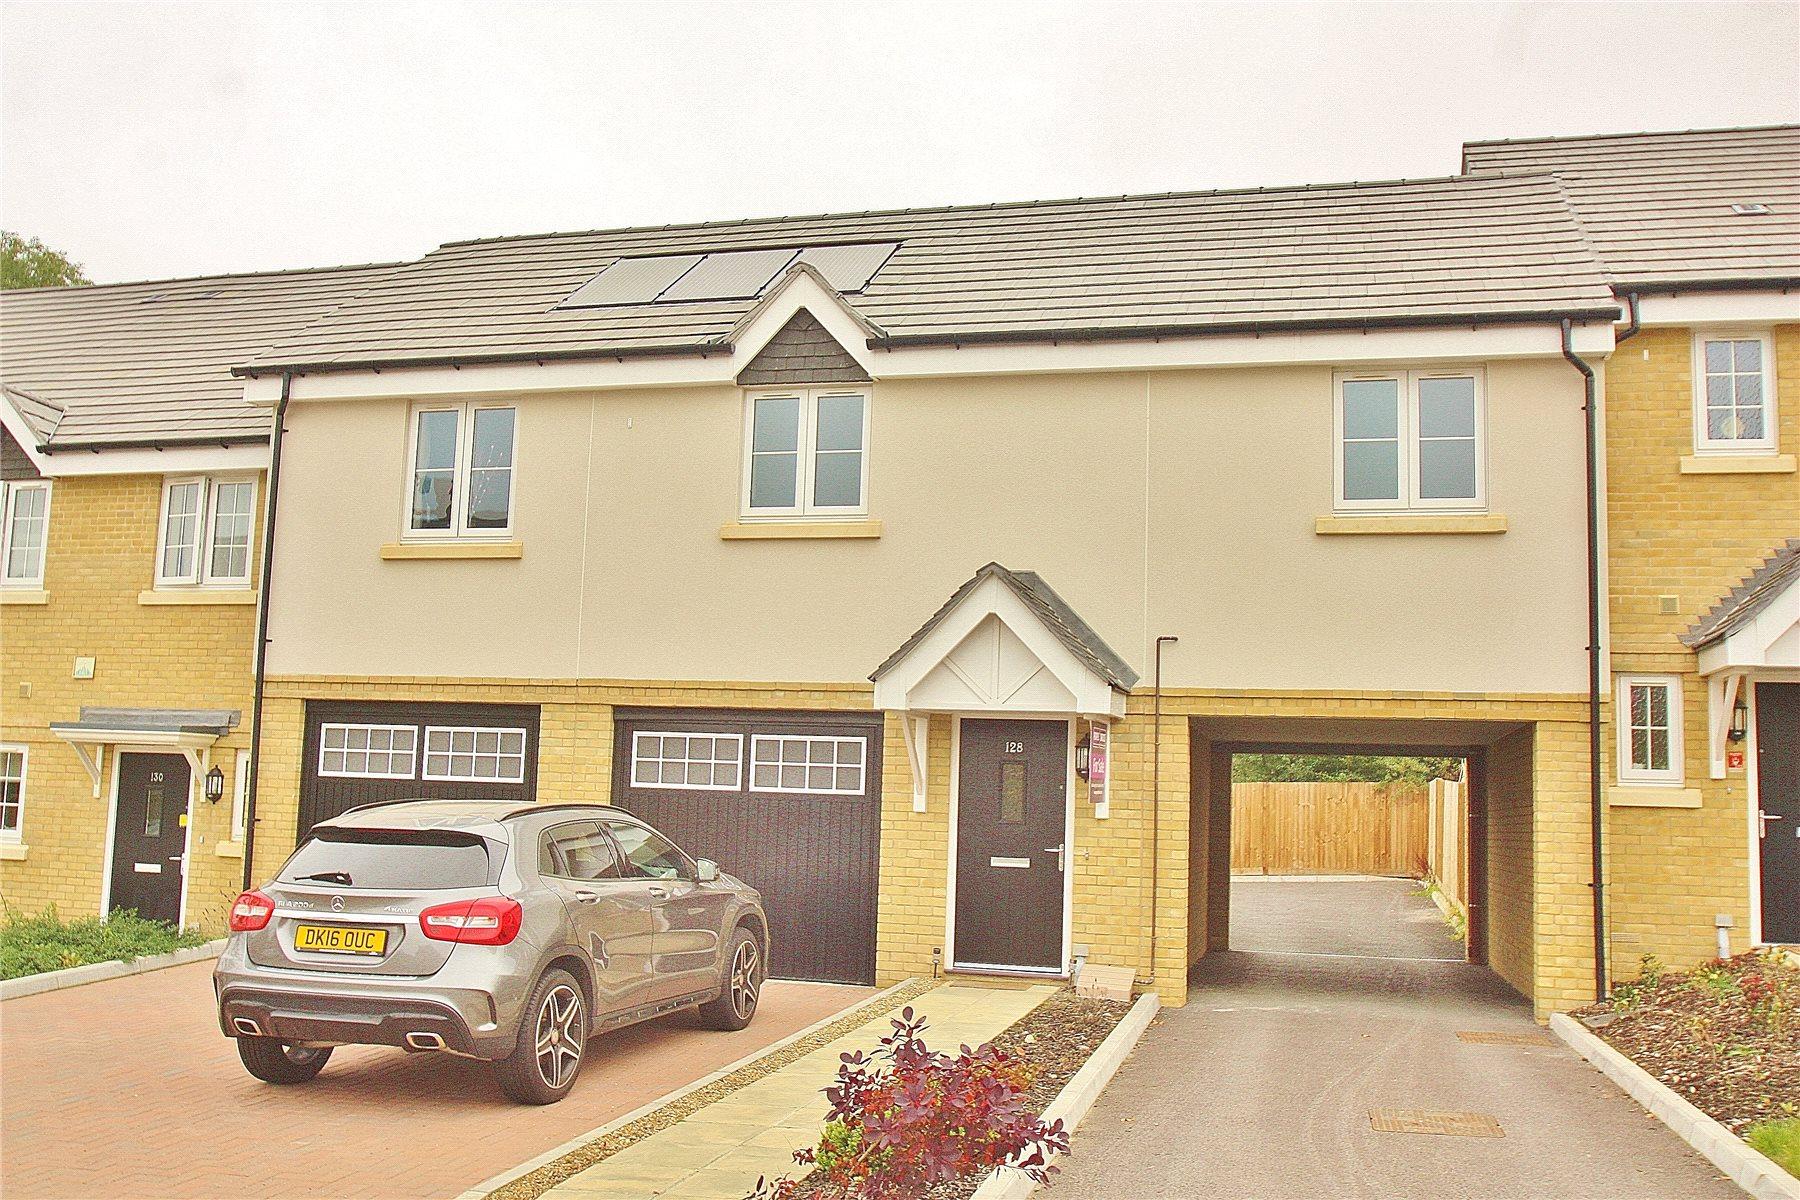 2 Bedrooms Apartment Flat for sale in Brookwood Farm Drive, Knaphill, Woking, Surrey, GU21